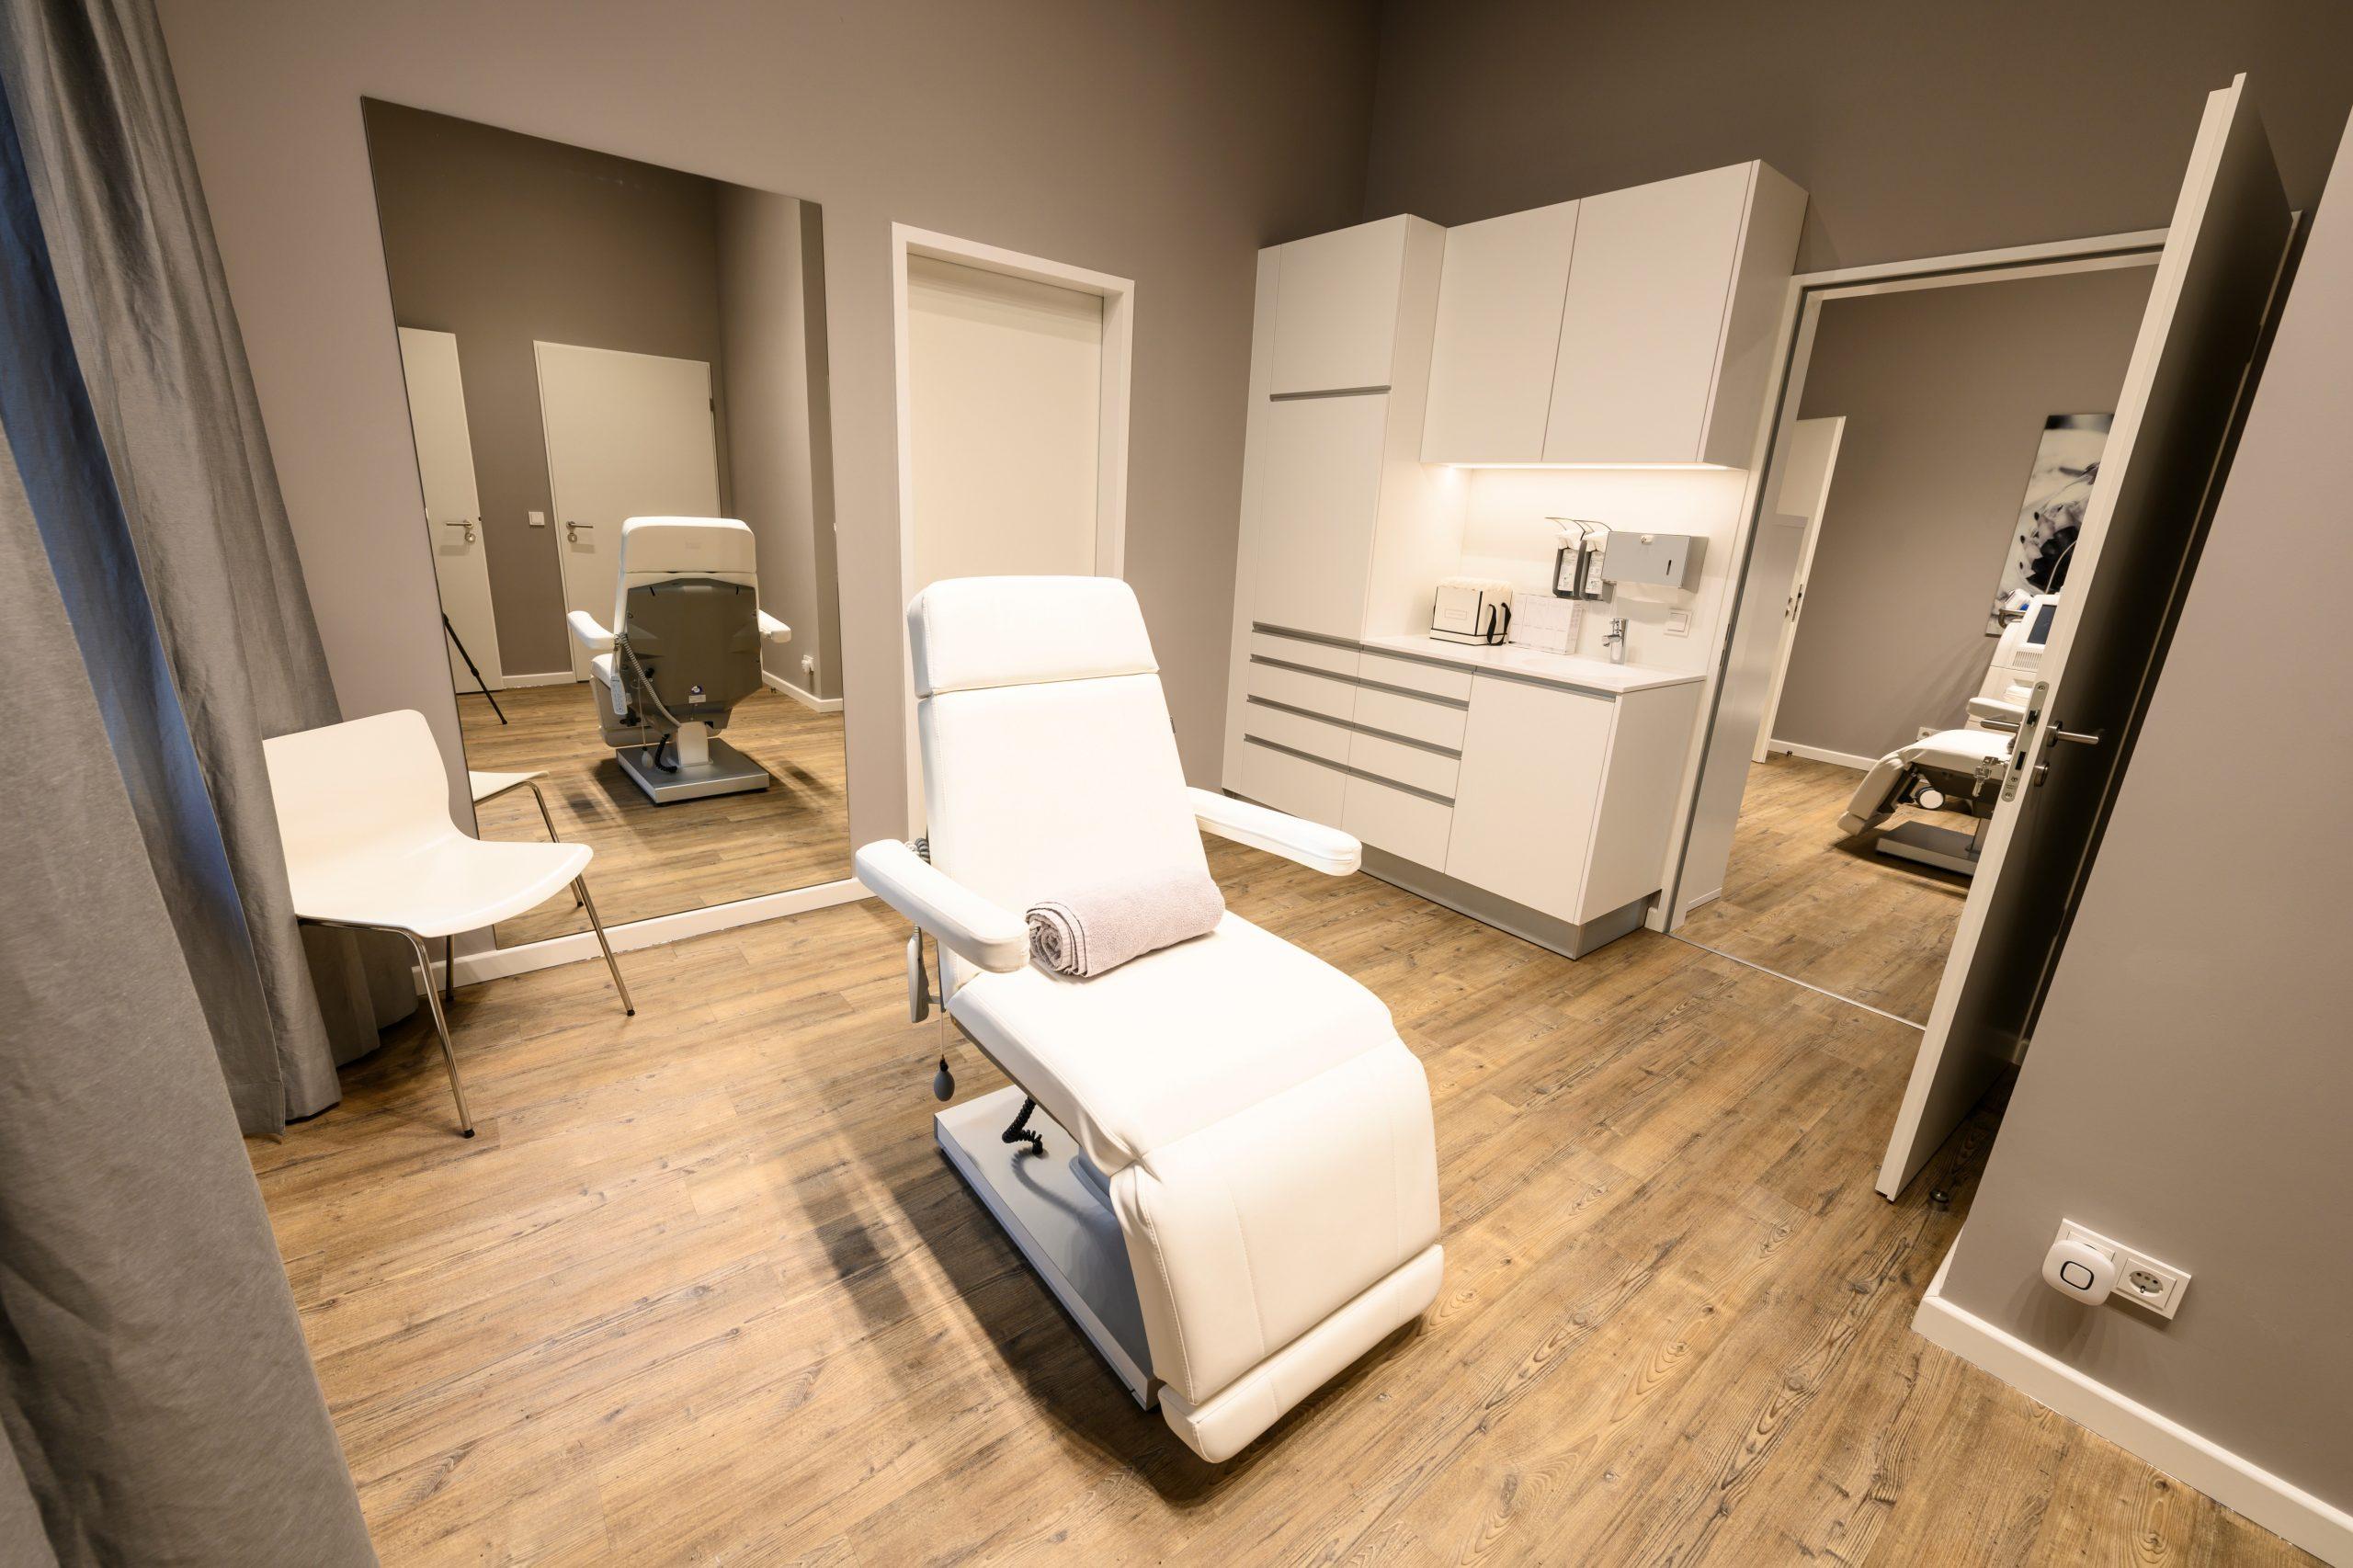 Schönheitschirurgie Berlin | Plastische Chirurgie Dr. med. Indra Mertz Klinik